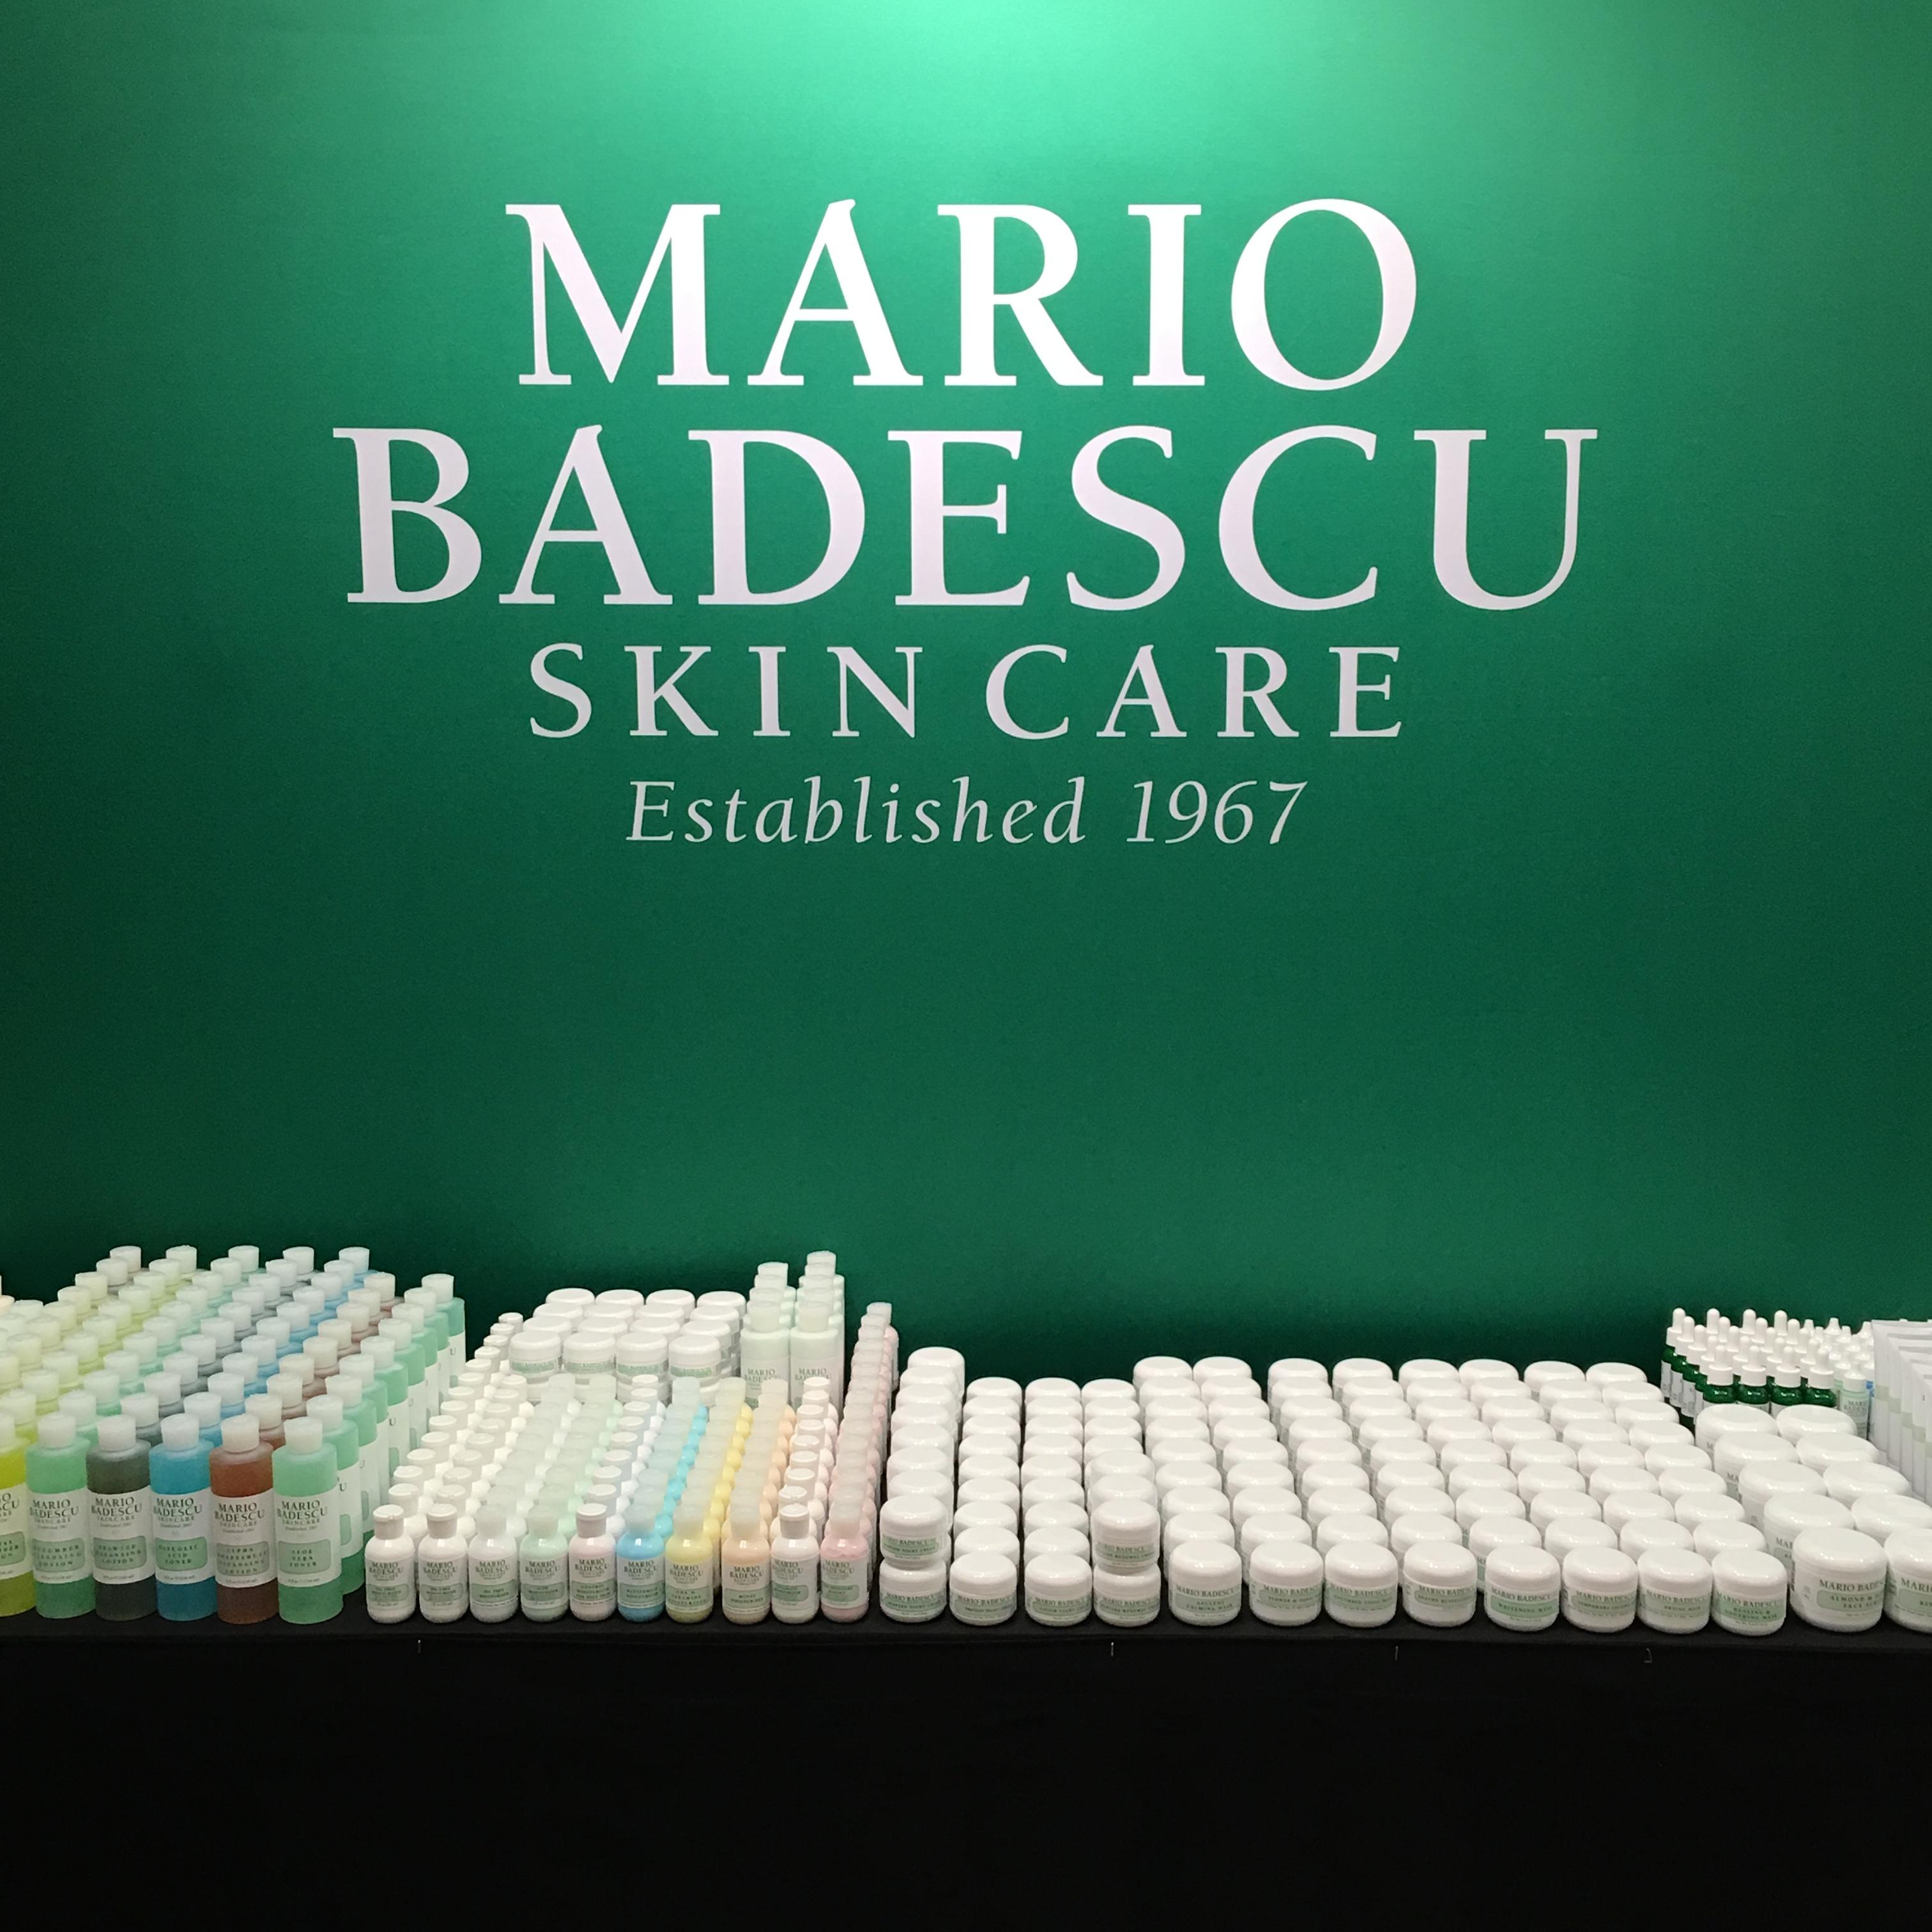 Mario Badescu at The Makeup Show New York City